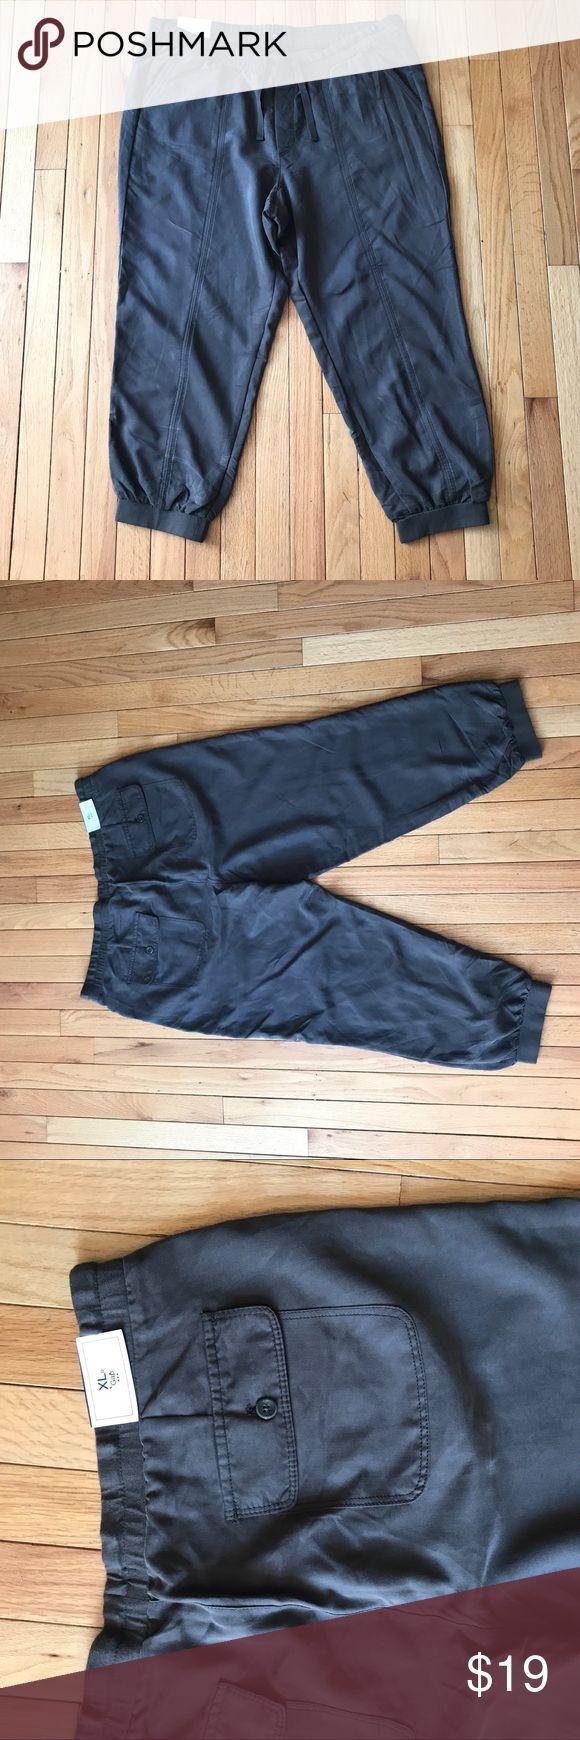 Gap Dark Olive Green Joggers Gap soft and comfy olive green joggers GAP Pants Track Pants & Joggers